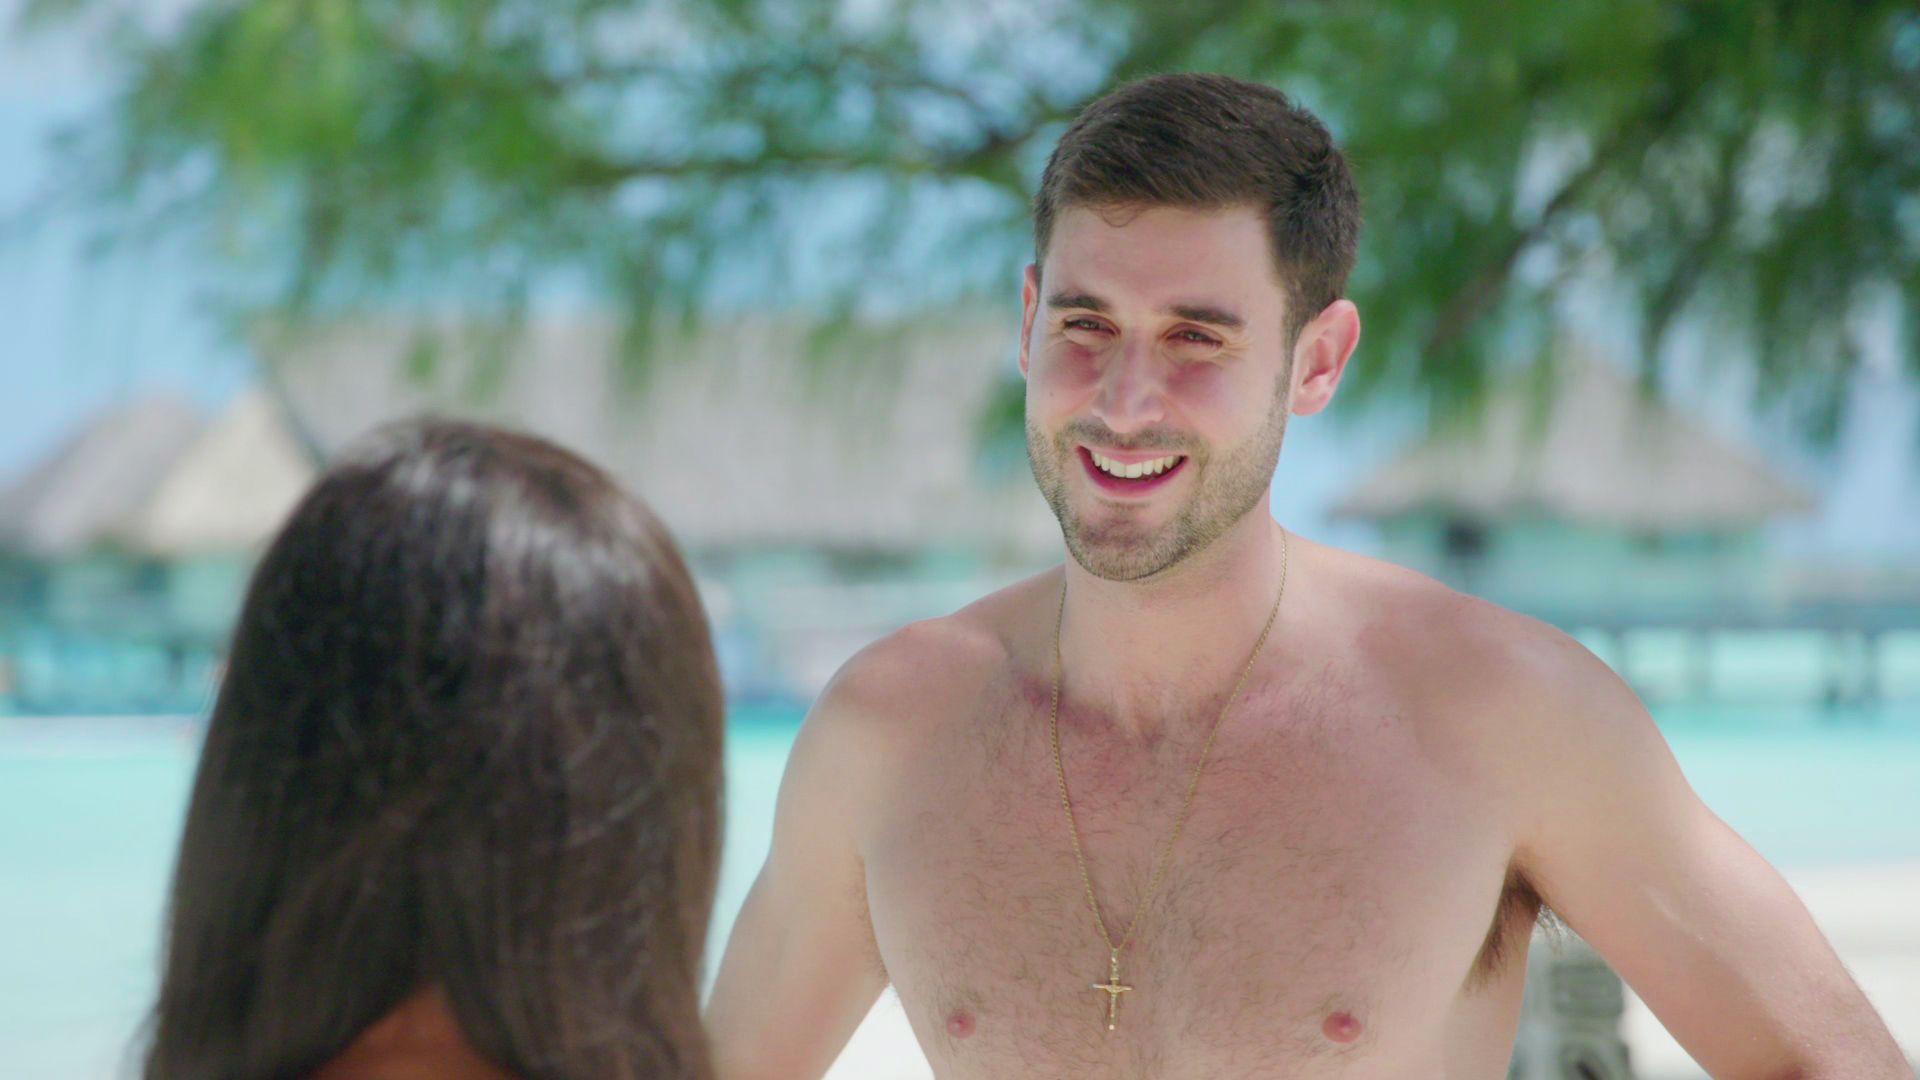 Sneak Peek - Natalie And David Hit It Off - Dating Naked  Vh1-2448